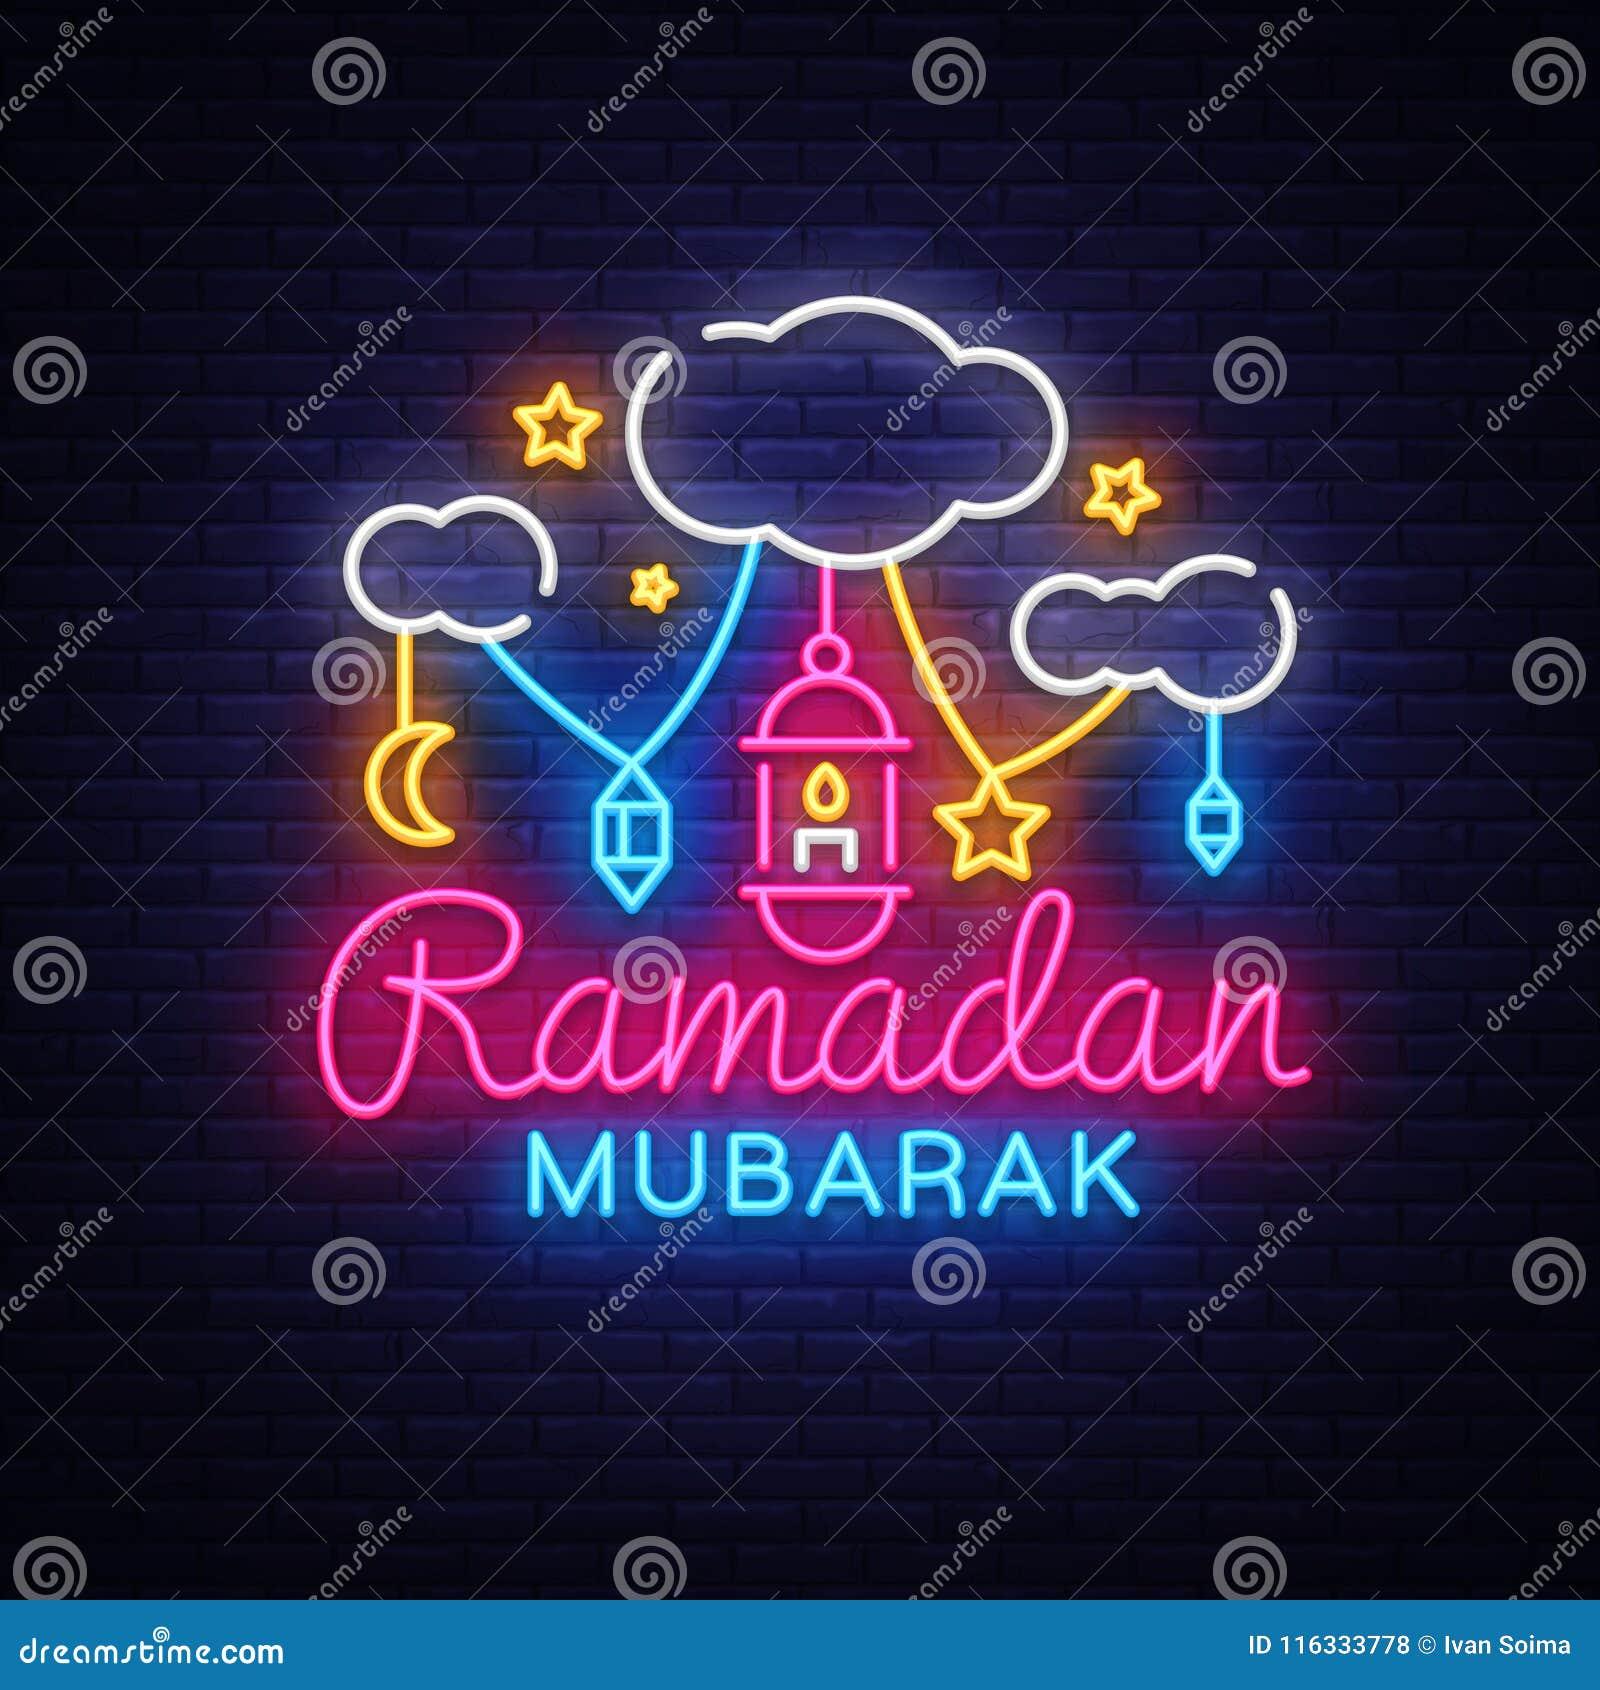 Ramadan mubarak greeting card vector ramadan mubarak neon sign download ramadan mubarak greeting card vector ramadan mubarak neon sign neon banner month m4hsunfo